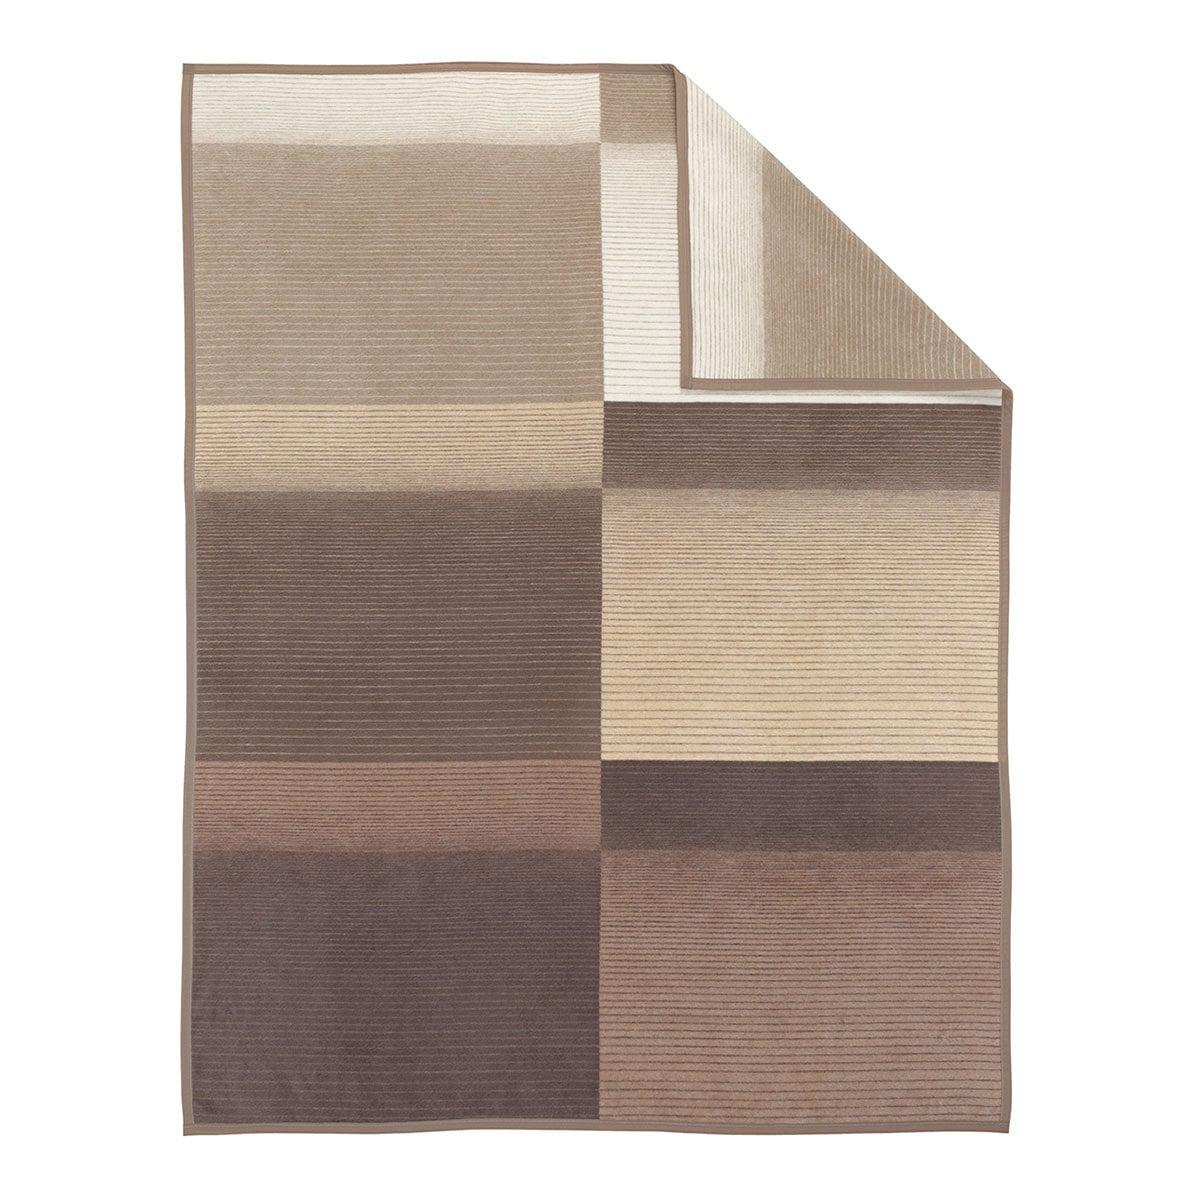 ibena jacquard decke granada hellbraun g nstig online. Black Bedroom Furniture Sets. Home Design Ideas